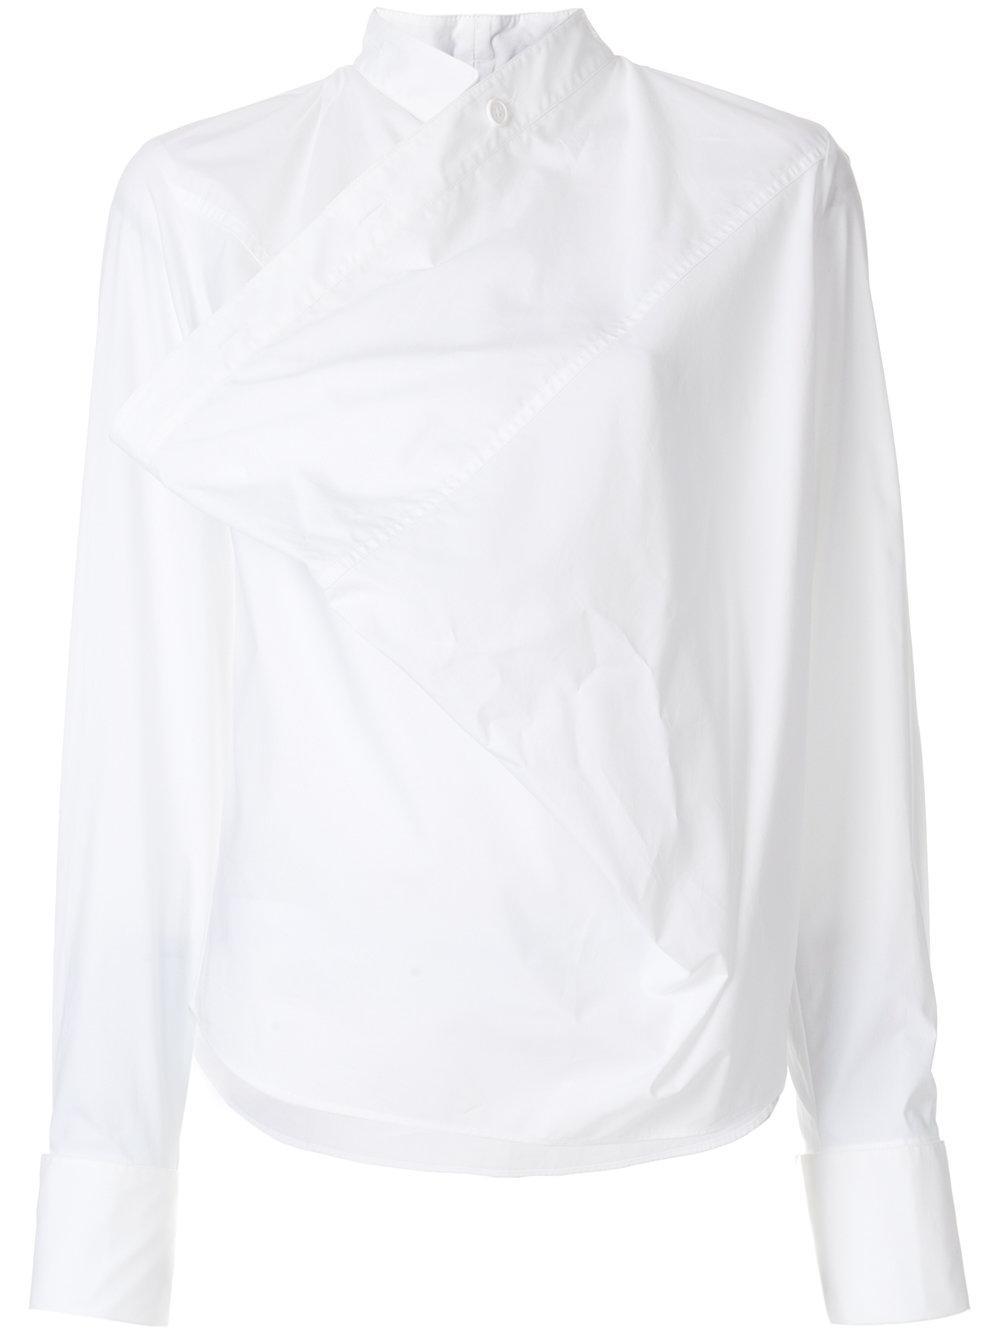 Factory Outlet Online Footlocker Finishline Sale Online Mm6 By Maison Margiela Woman Color-block Coated Cotton-jersey Top White Size L Maison Martin Margiela View Sneakernews For Sale 4qBTW96